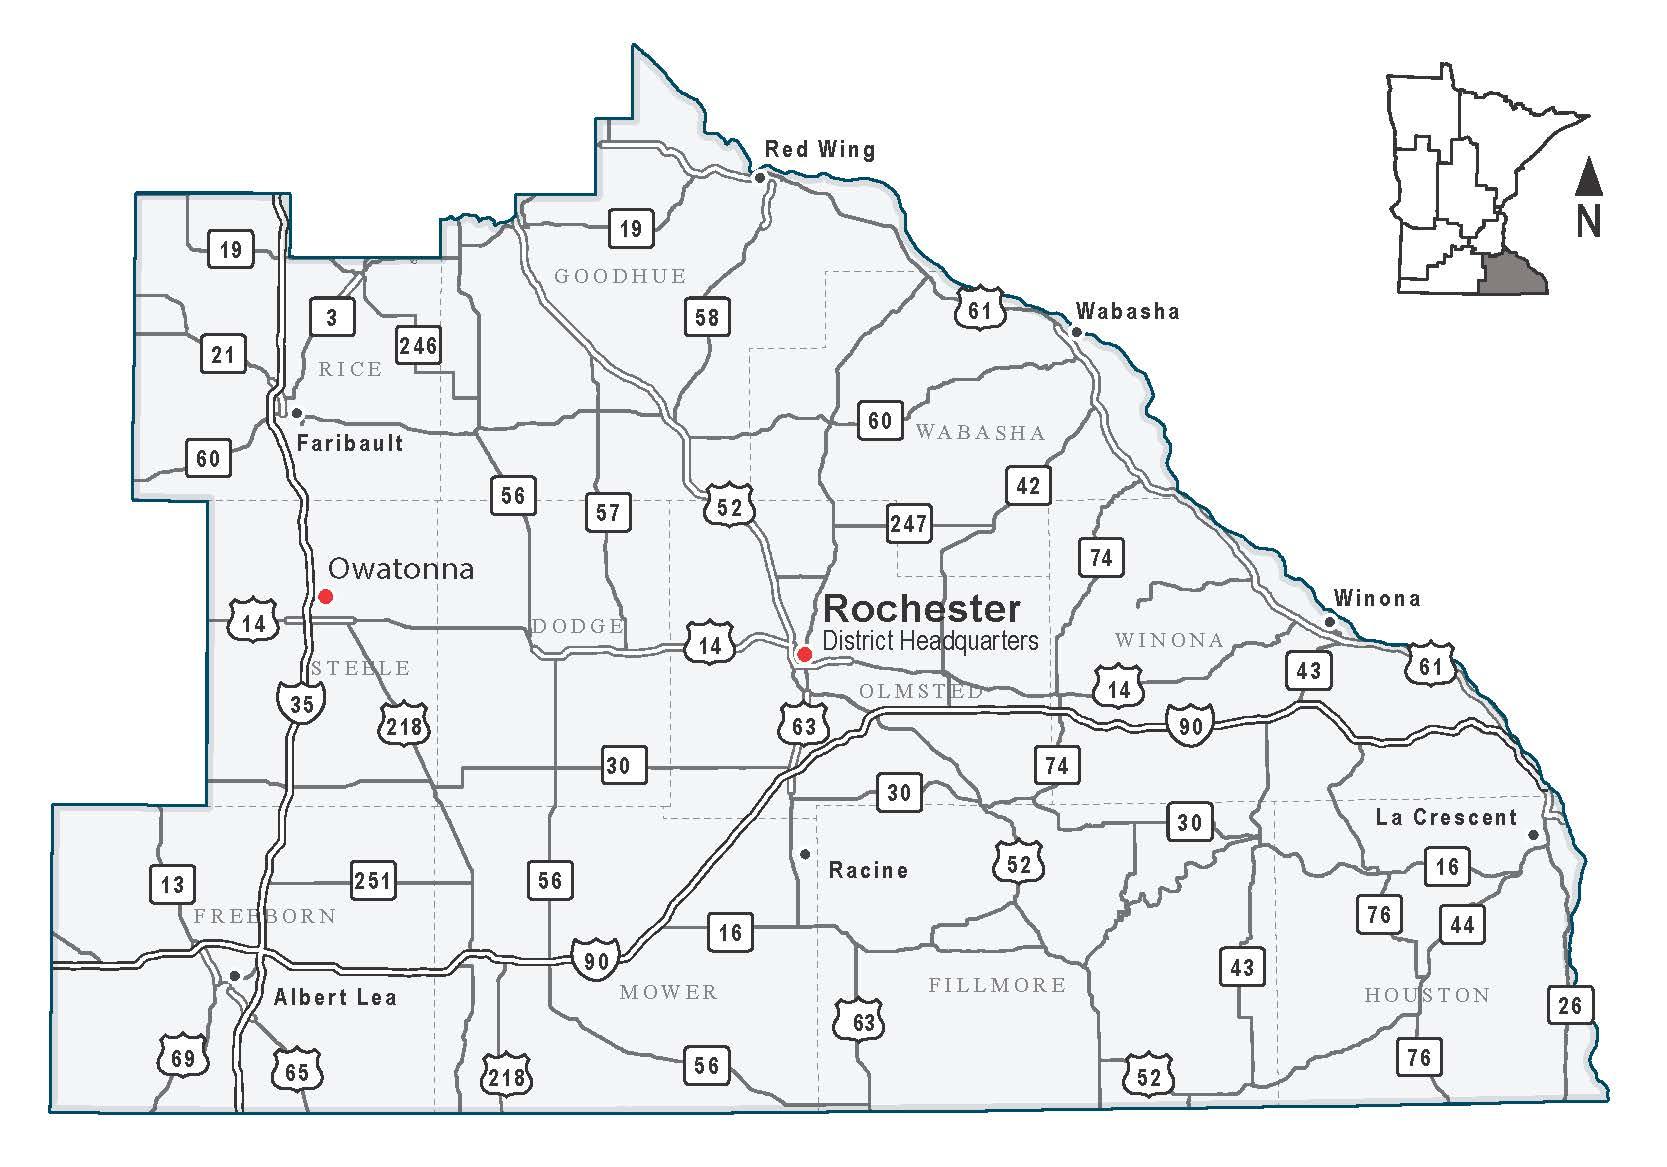 Southeast Minnesota District 6